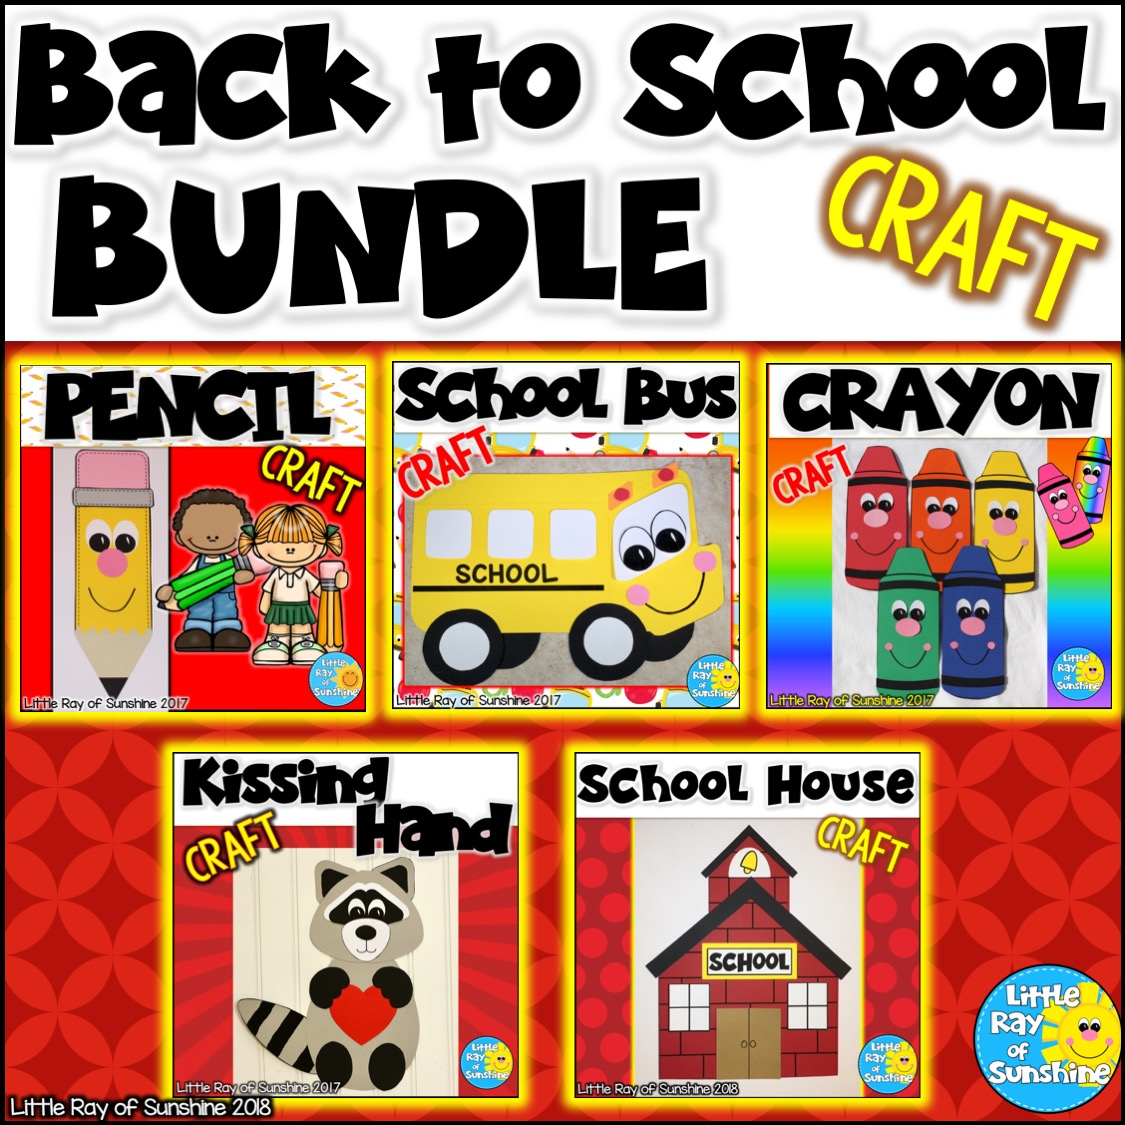 Back to School Craft Bundle